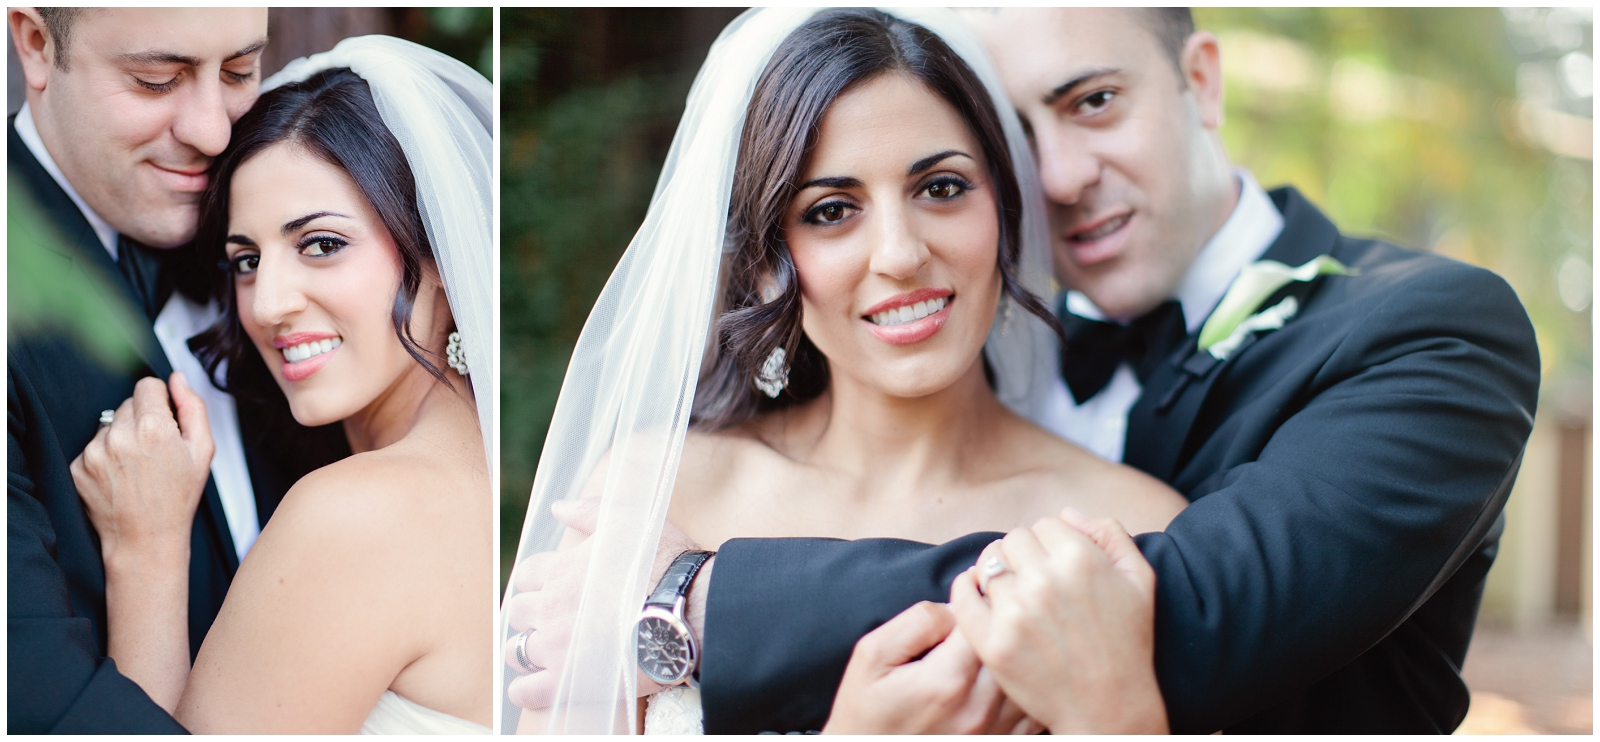 San-Francisco-Bay-Area-Wedding-Photography-Kennolyn-13.jpg